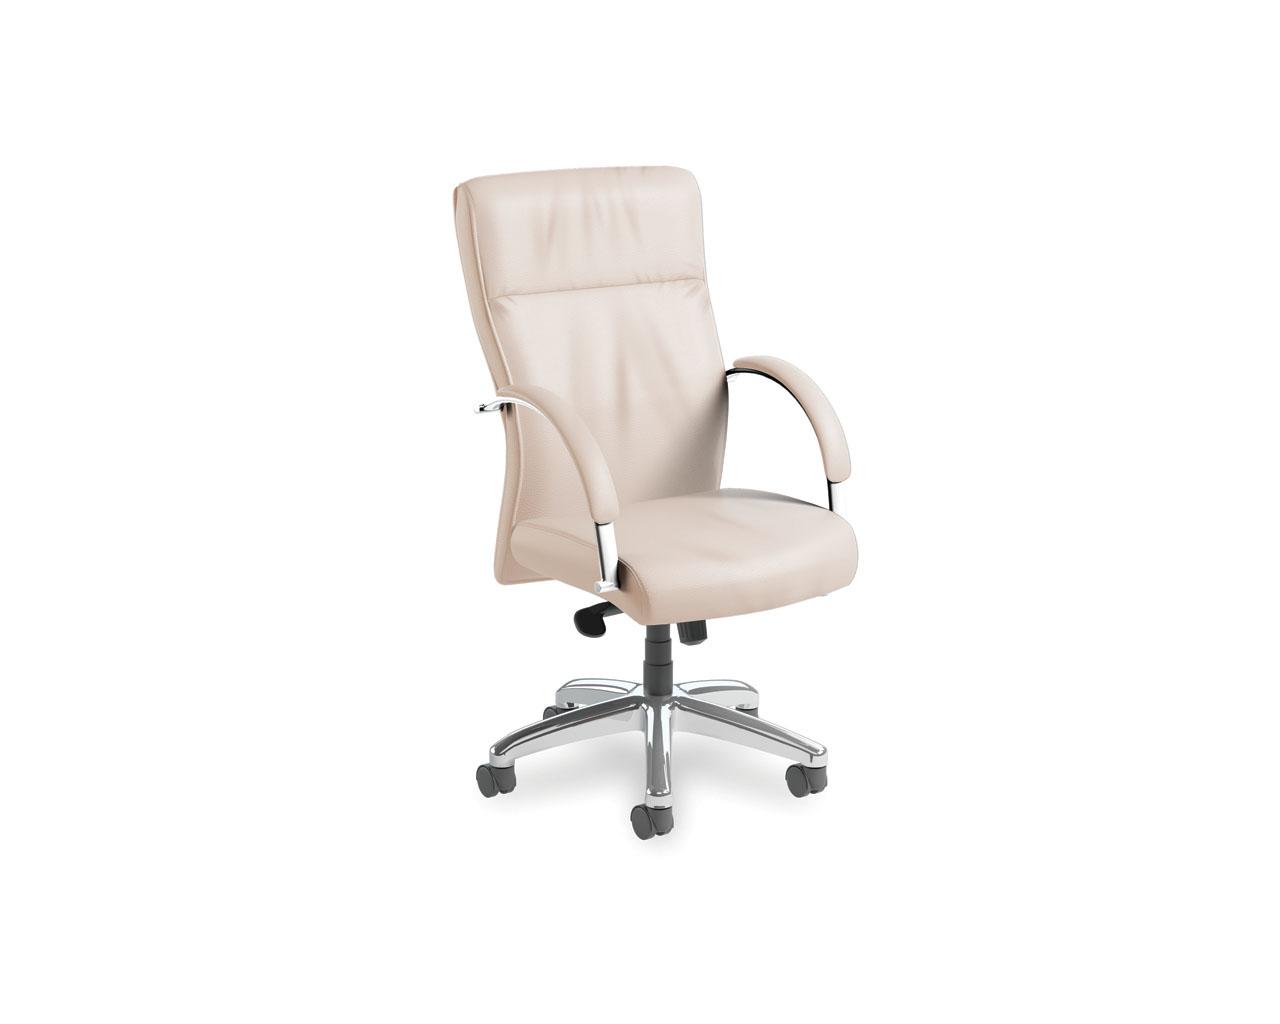 Khroma High Back Chair